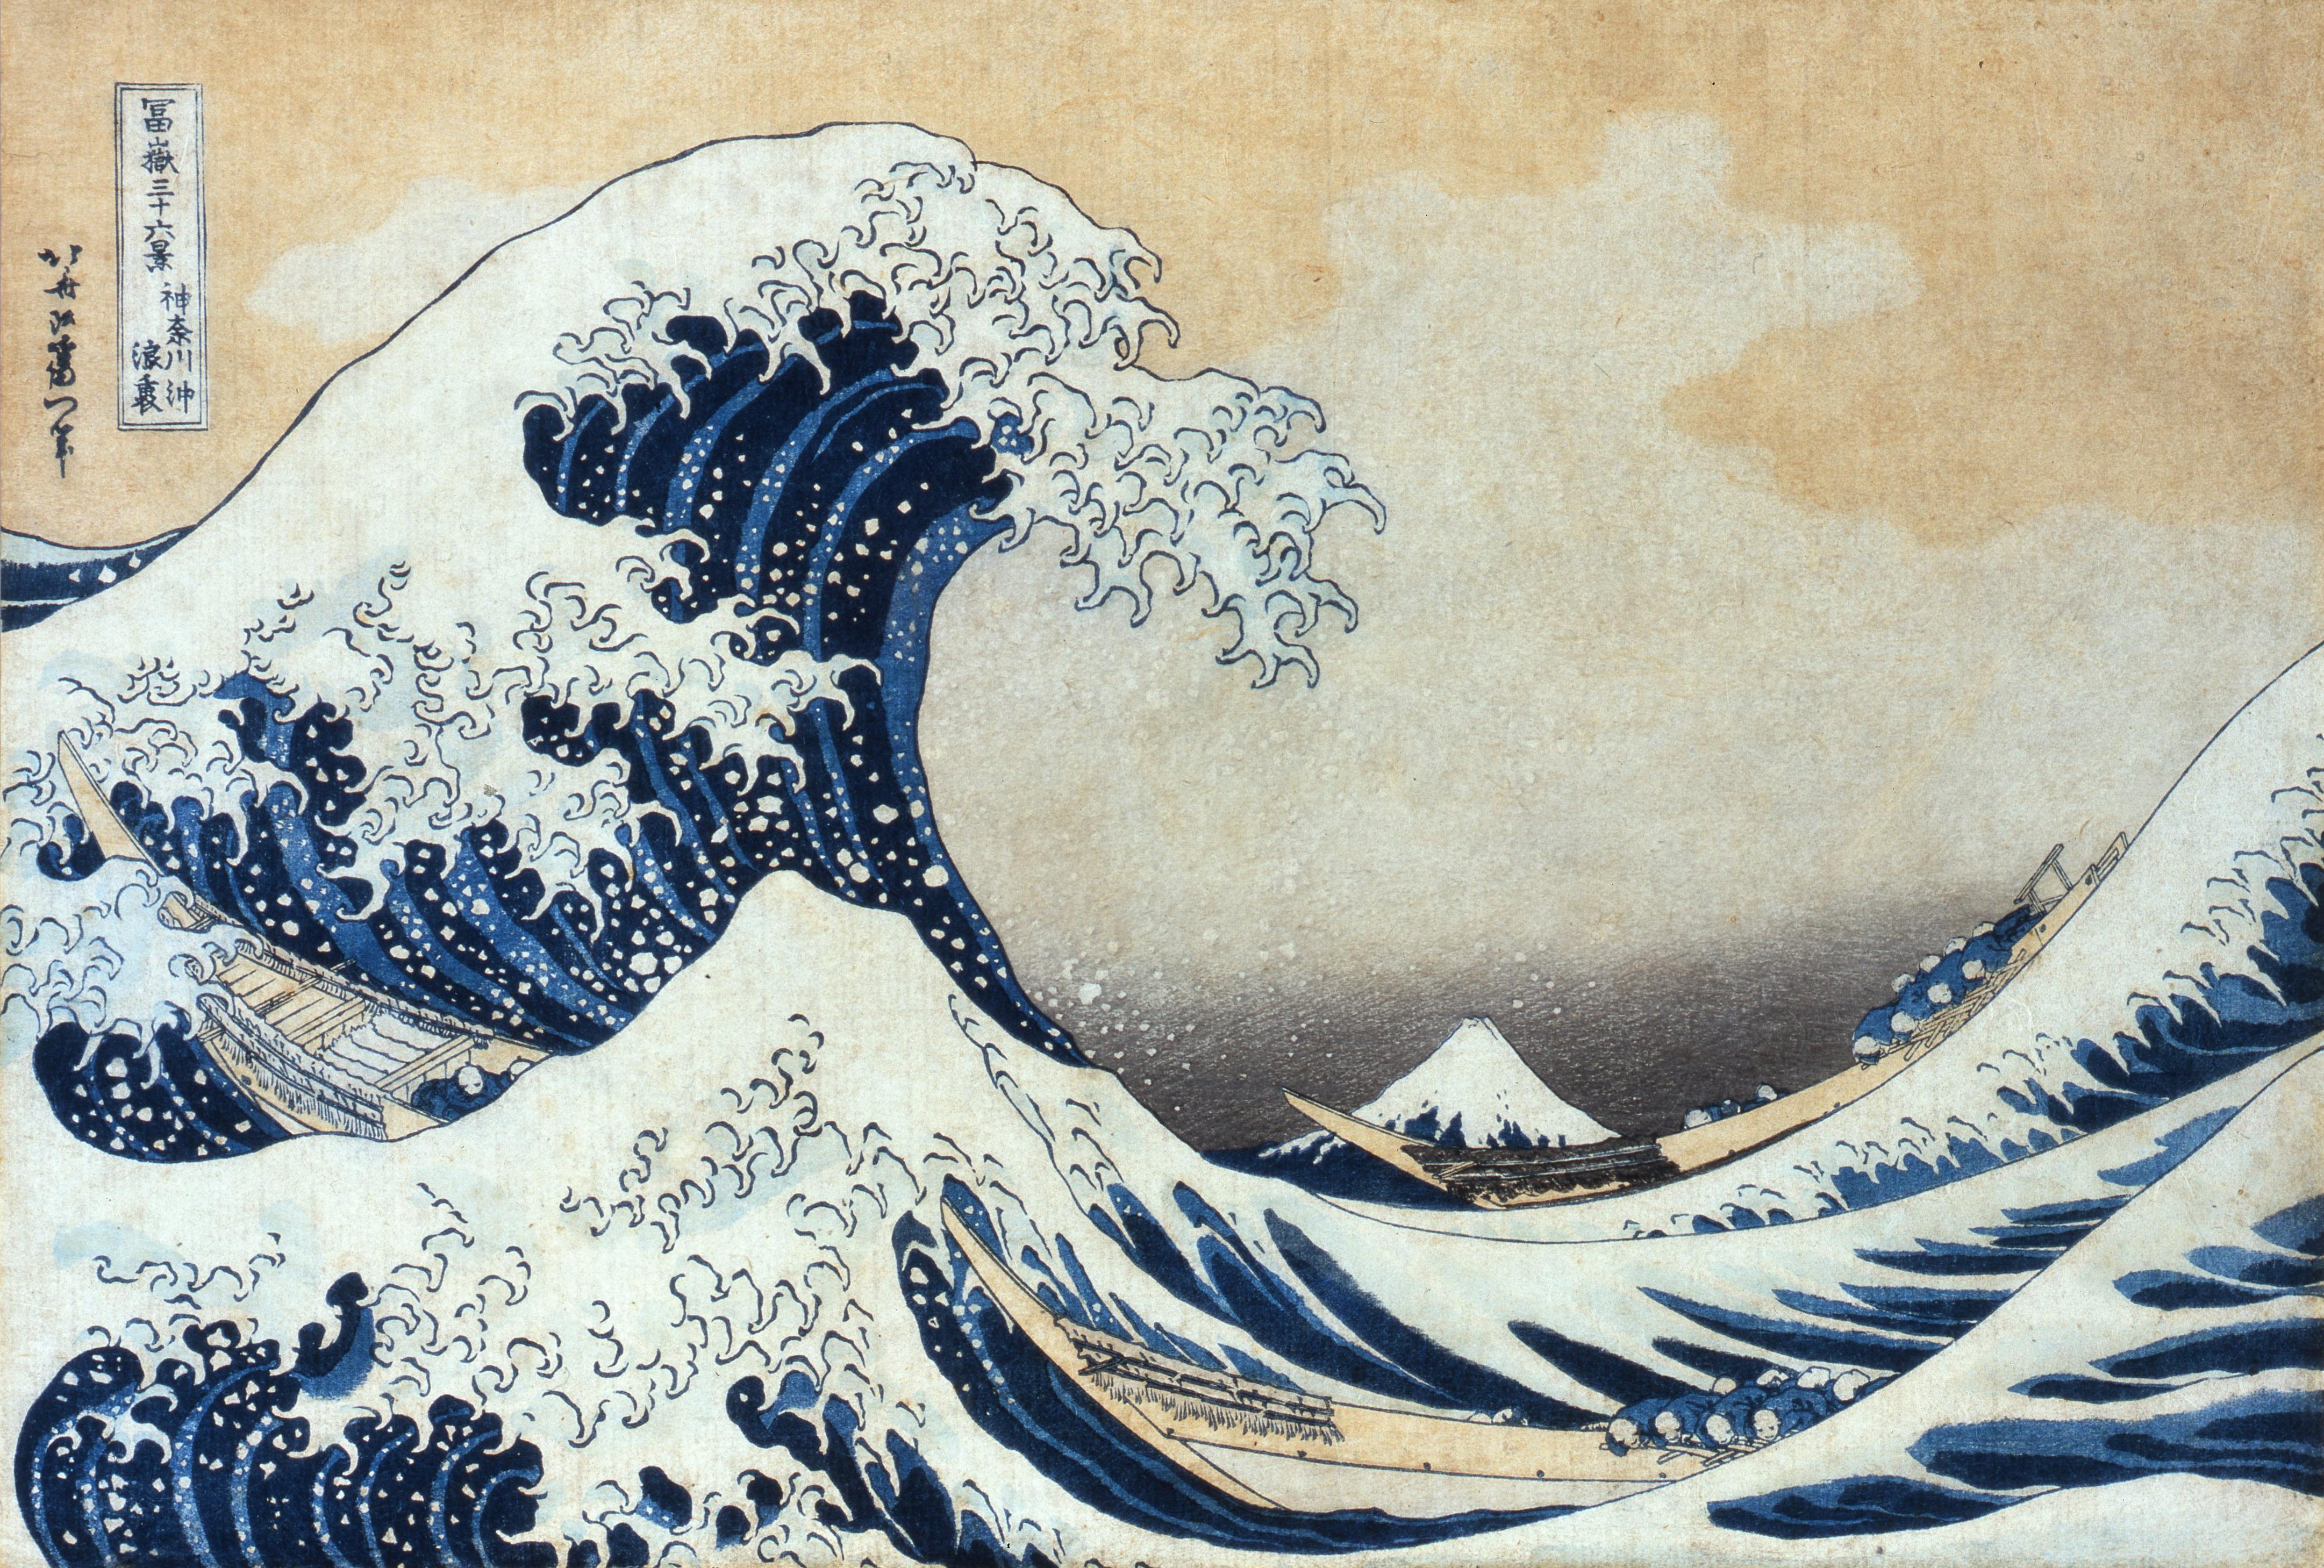 THE GREAT WAVE OFF KANAGAWA POSTER JAPANESE JAPAN MOUNT FUJI WALL ART LARGE